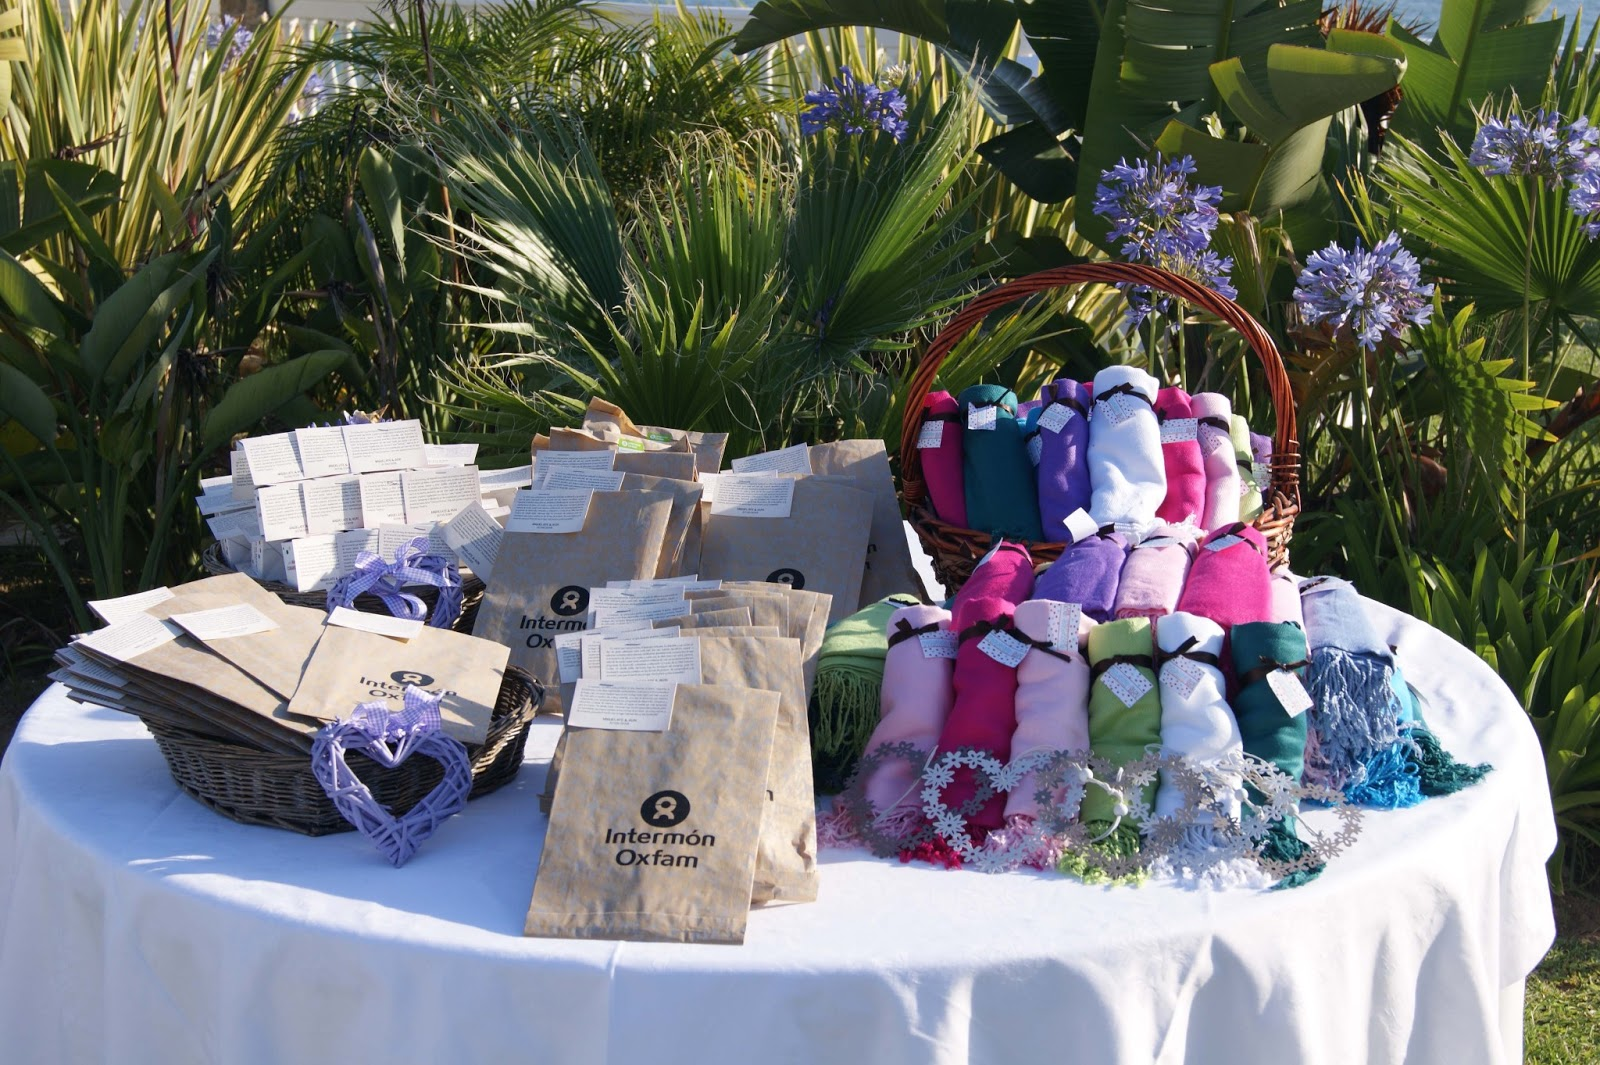 De detalles solidarios y bodas etc bah a bodas deco for Detalles decoracion boda